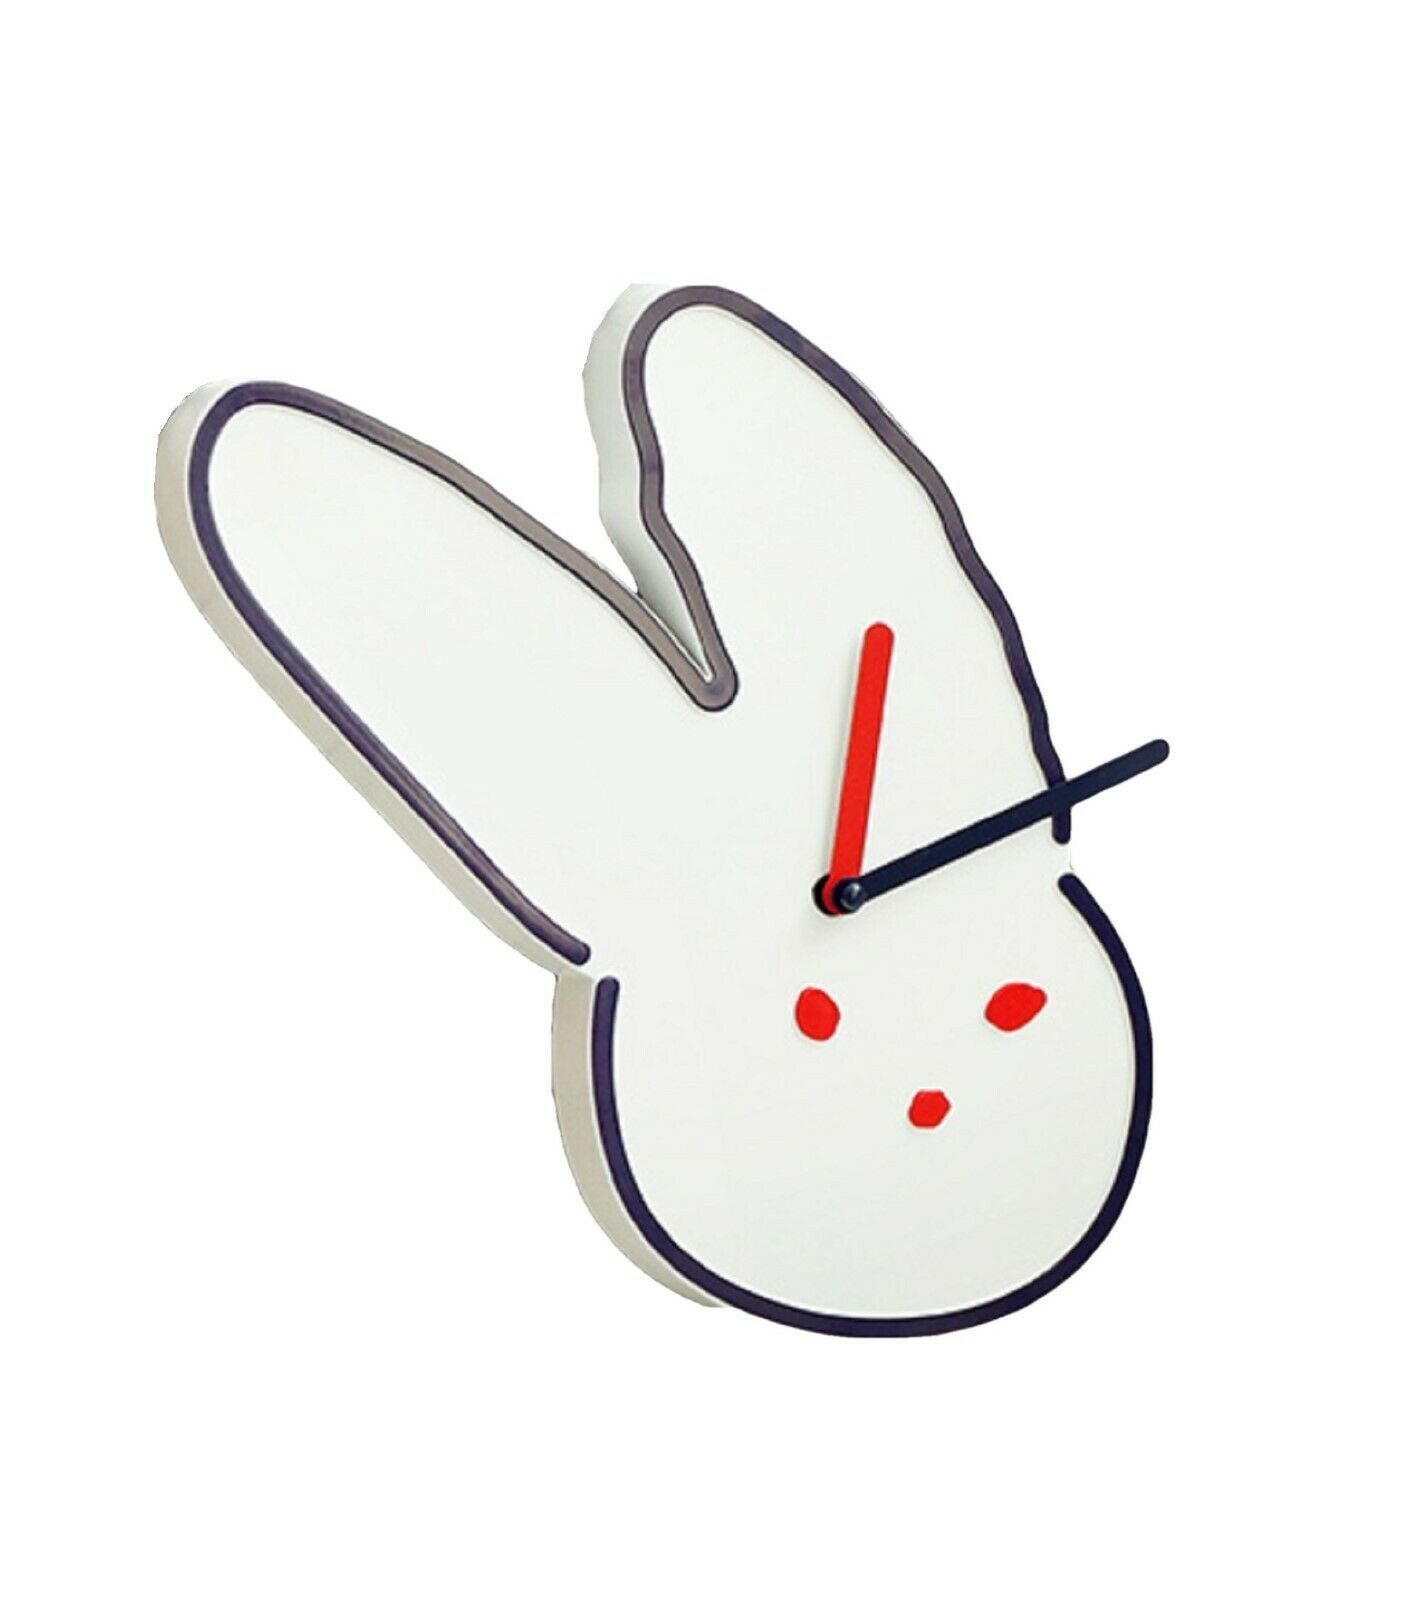 Brunch Brother Wall Clock Non-Ticking Silent Decorative Modern Clock (Rabbit)